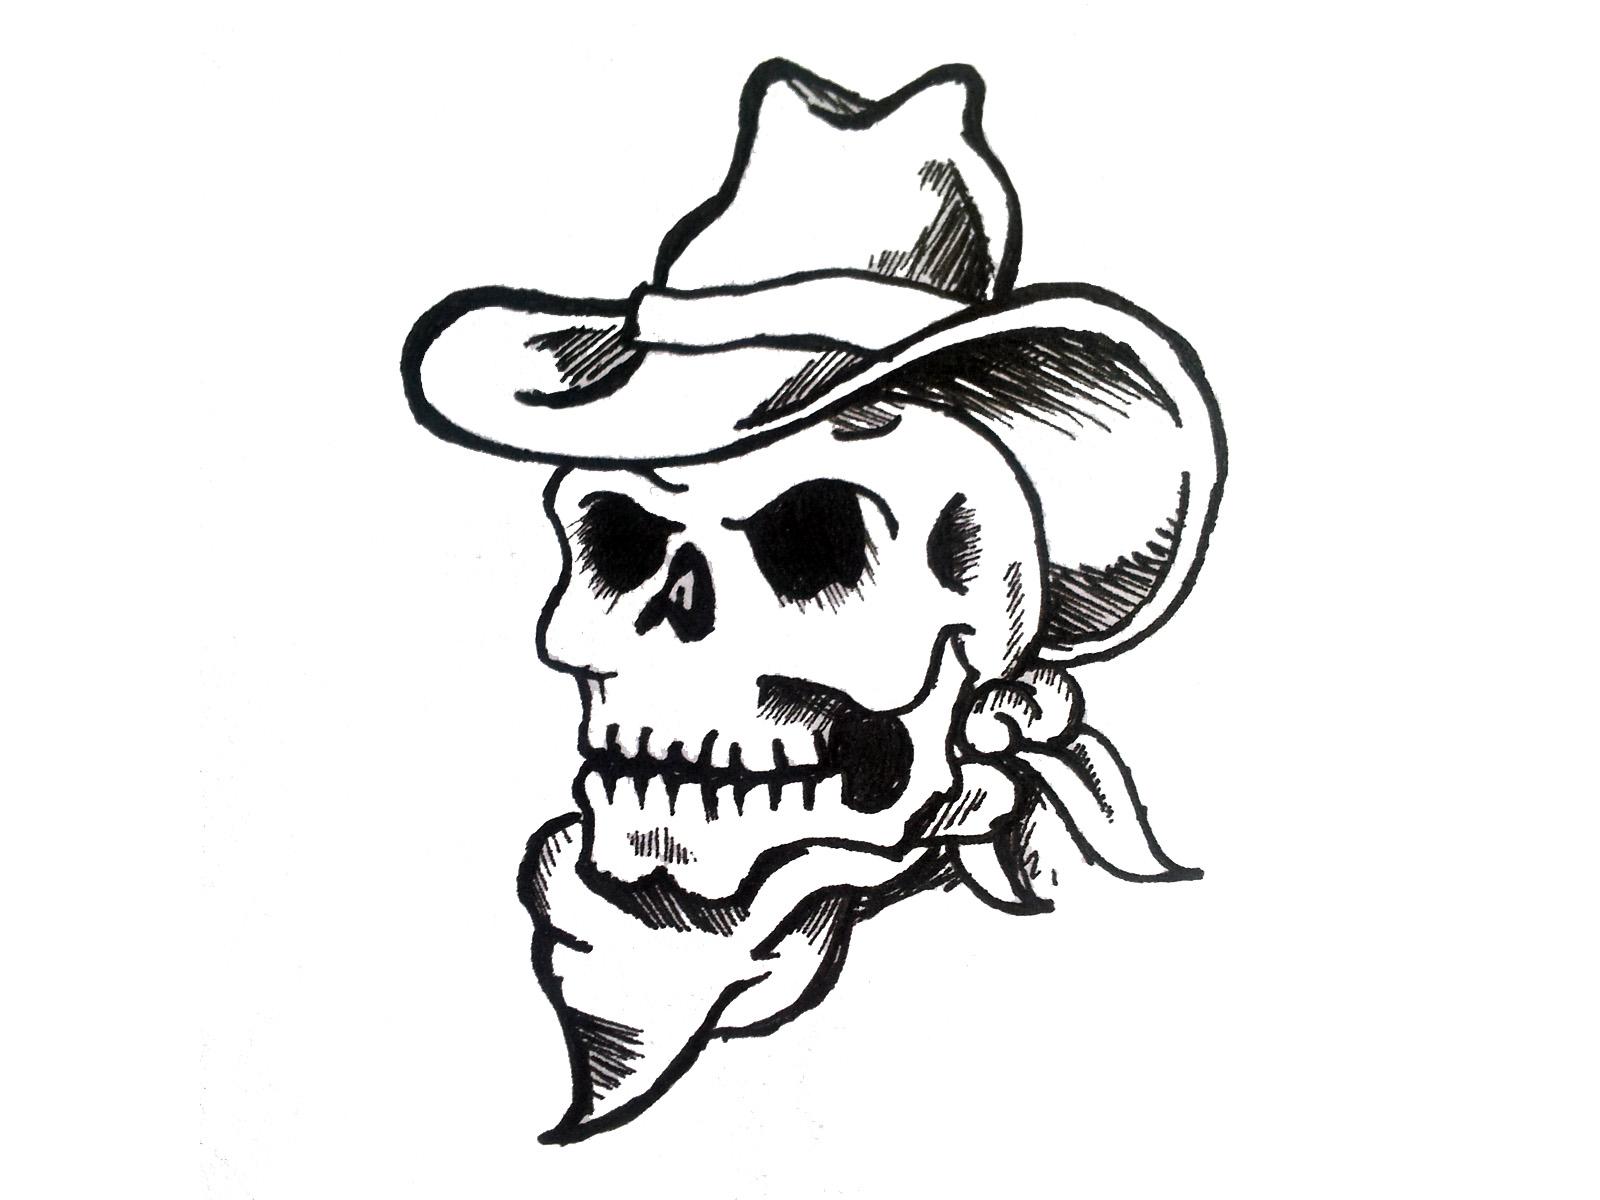 1600x1200 Collection Of Cowboy Skulls Tattoo Design